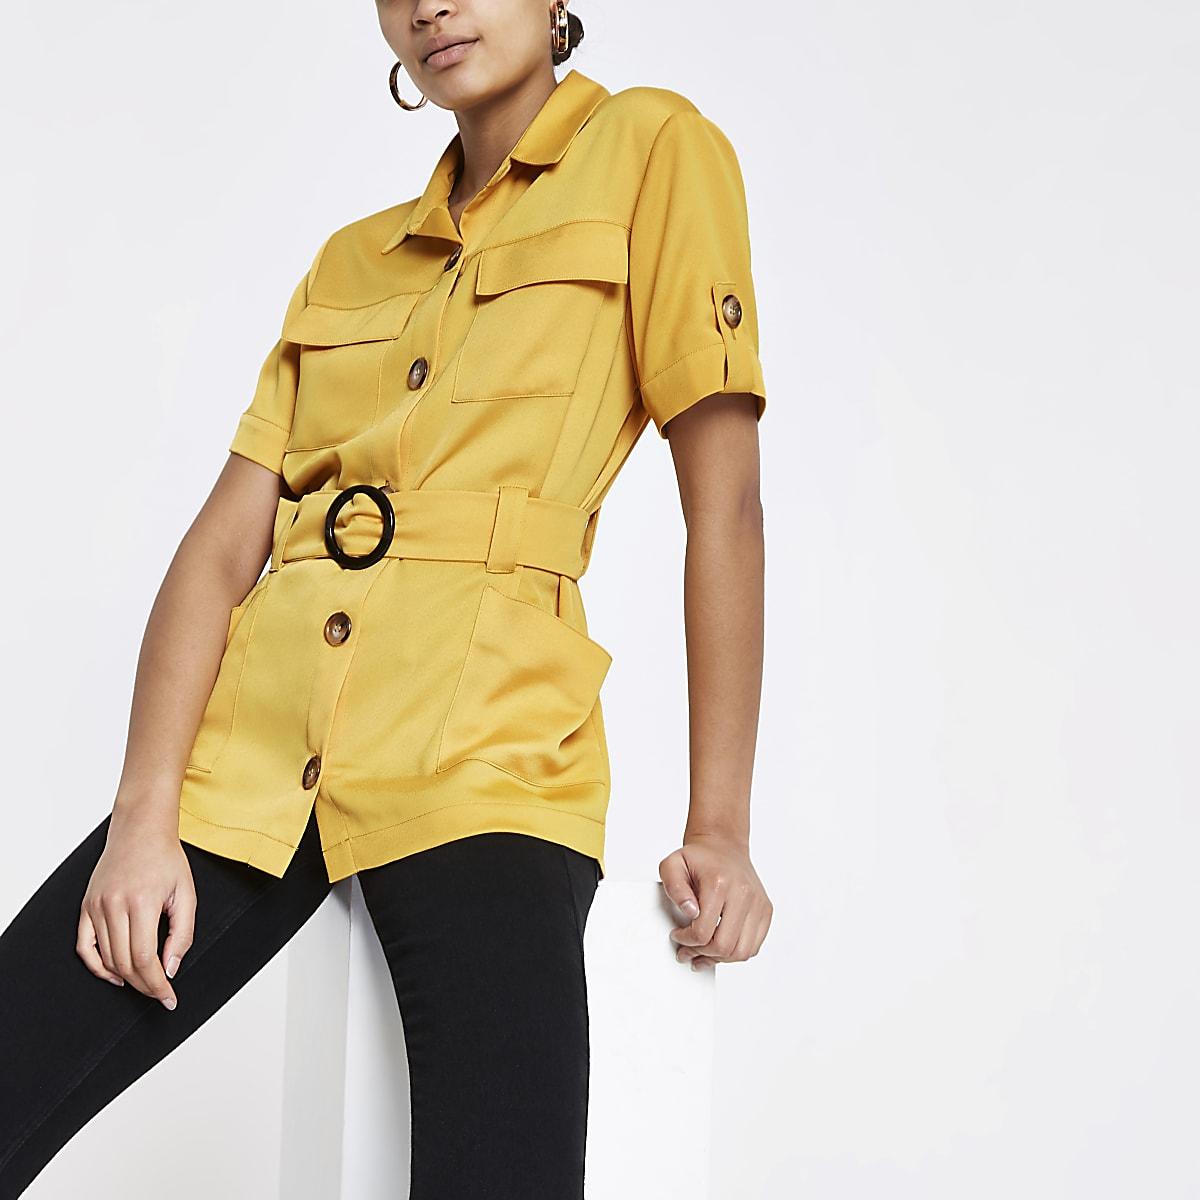 Yellow utility belted waist shirt